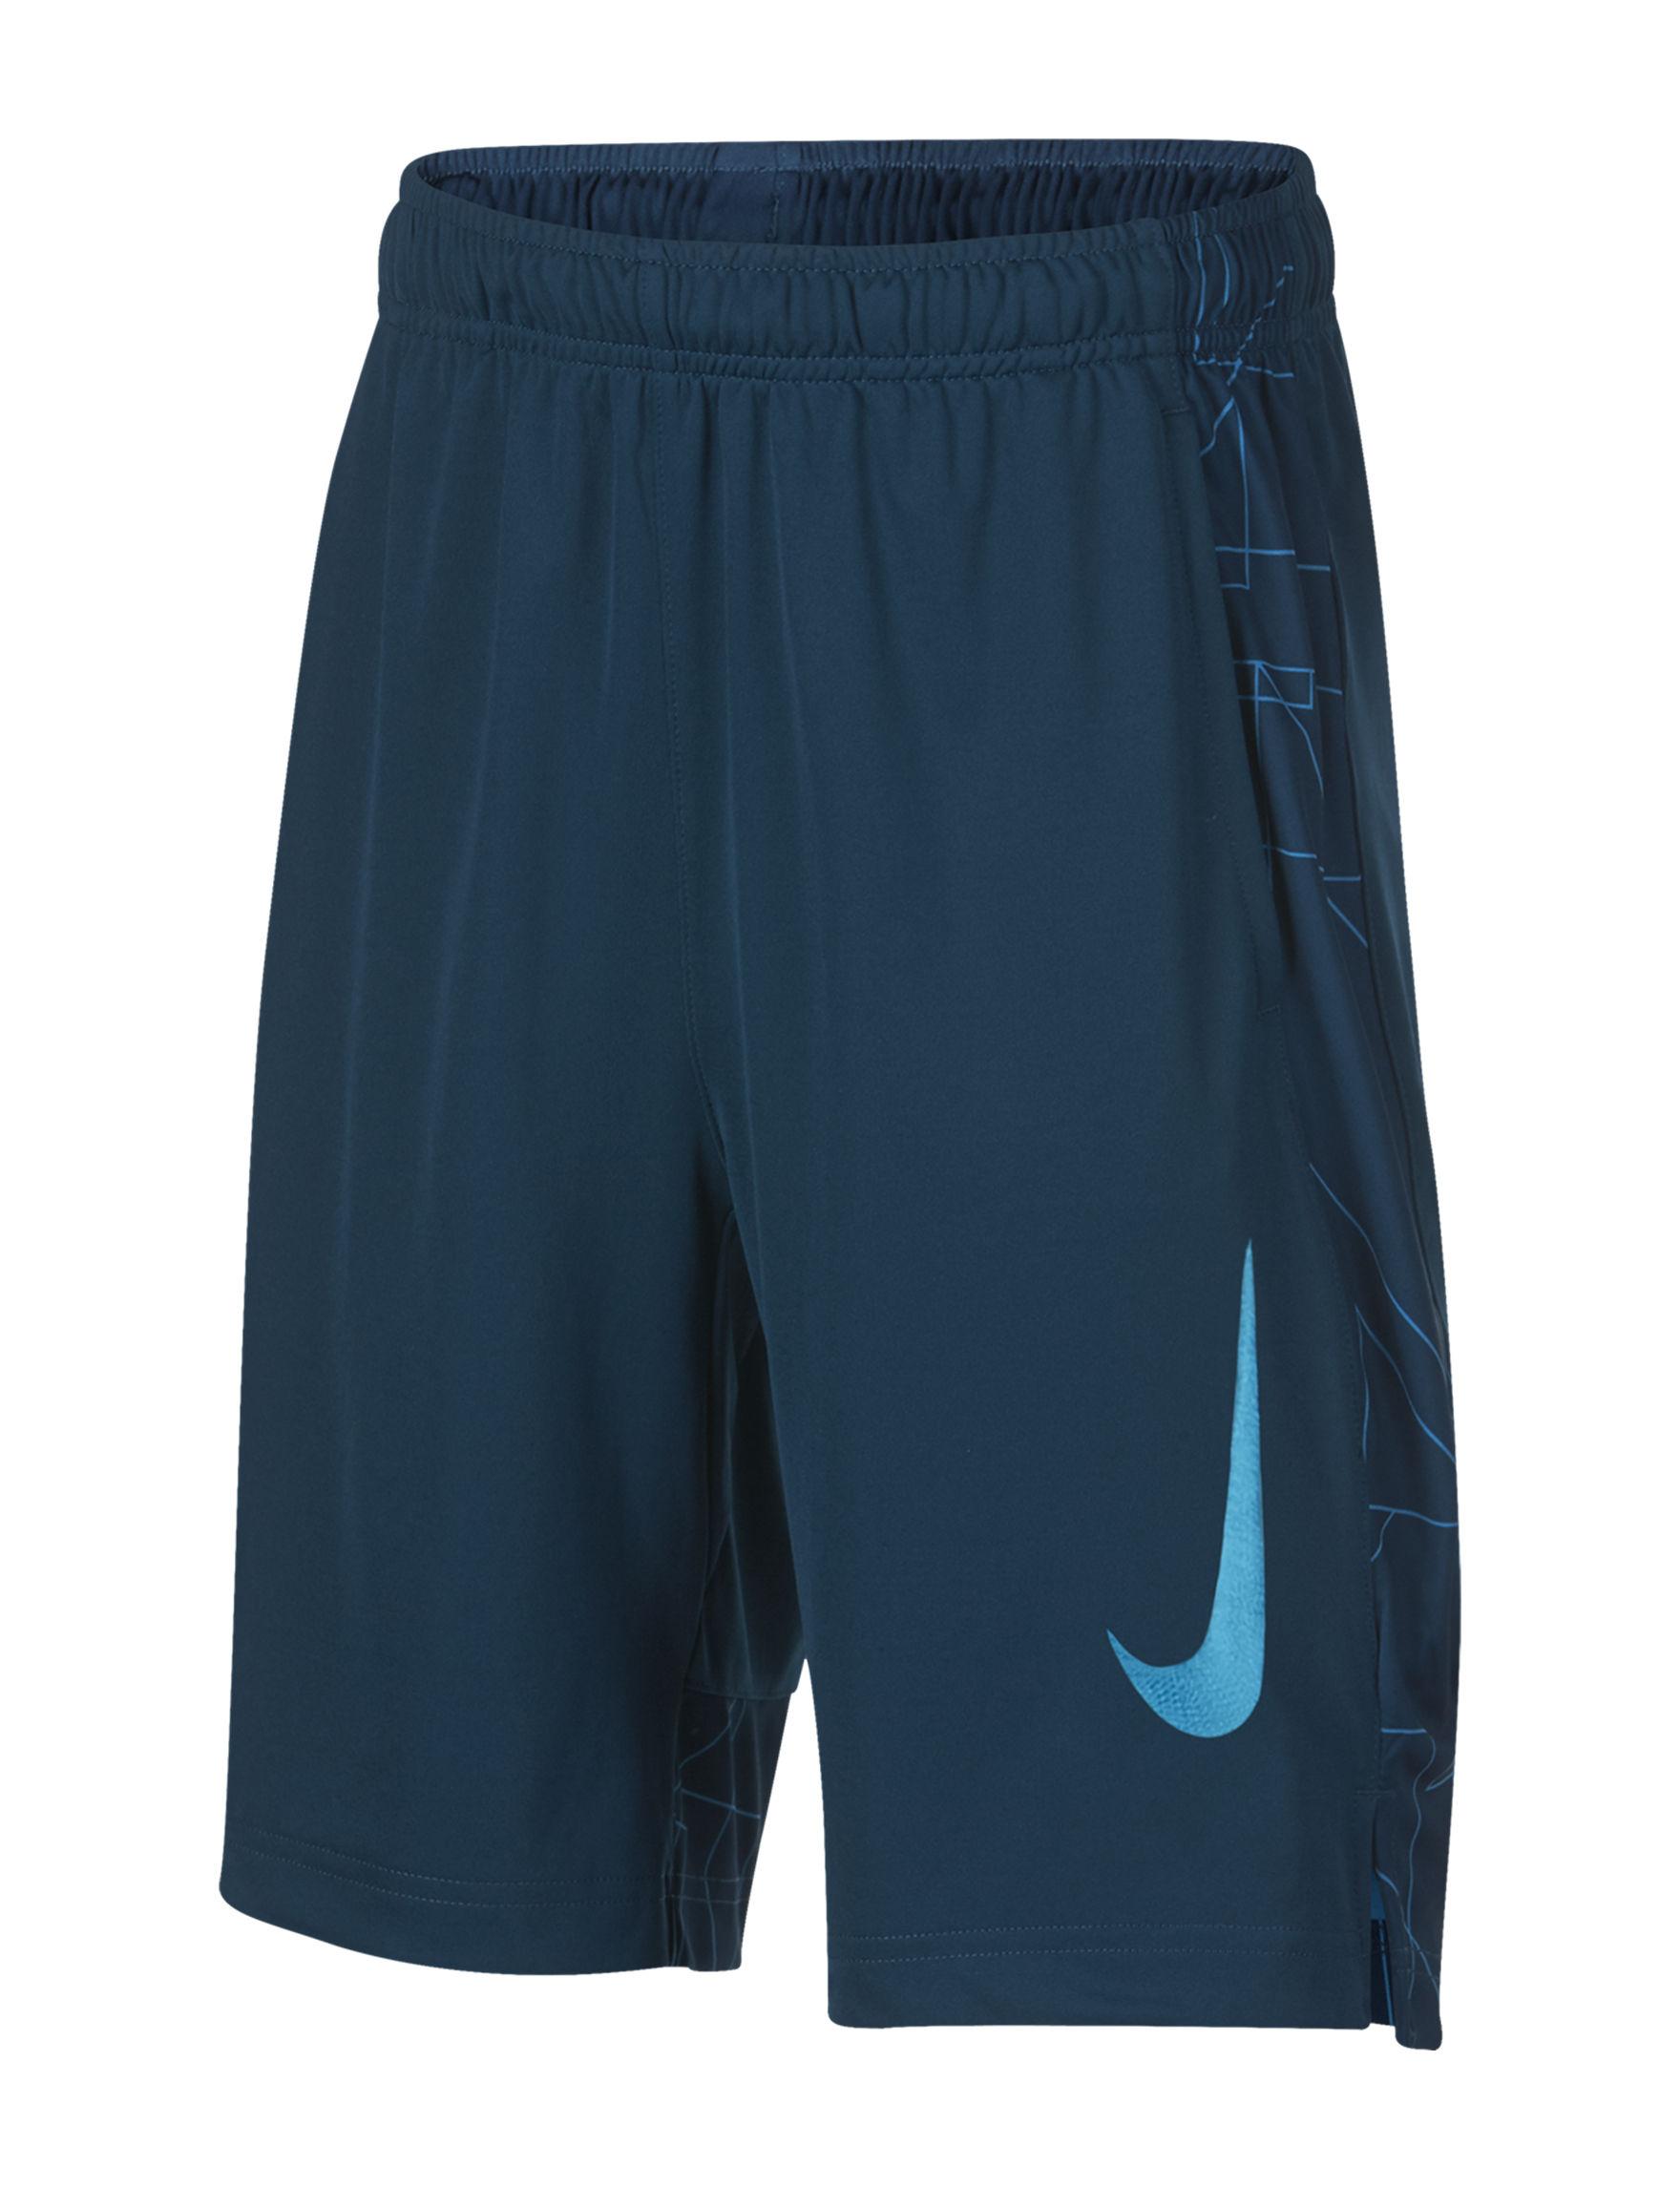 Nike Heather Blue